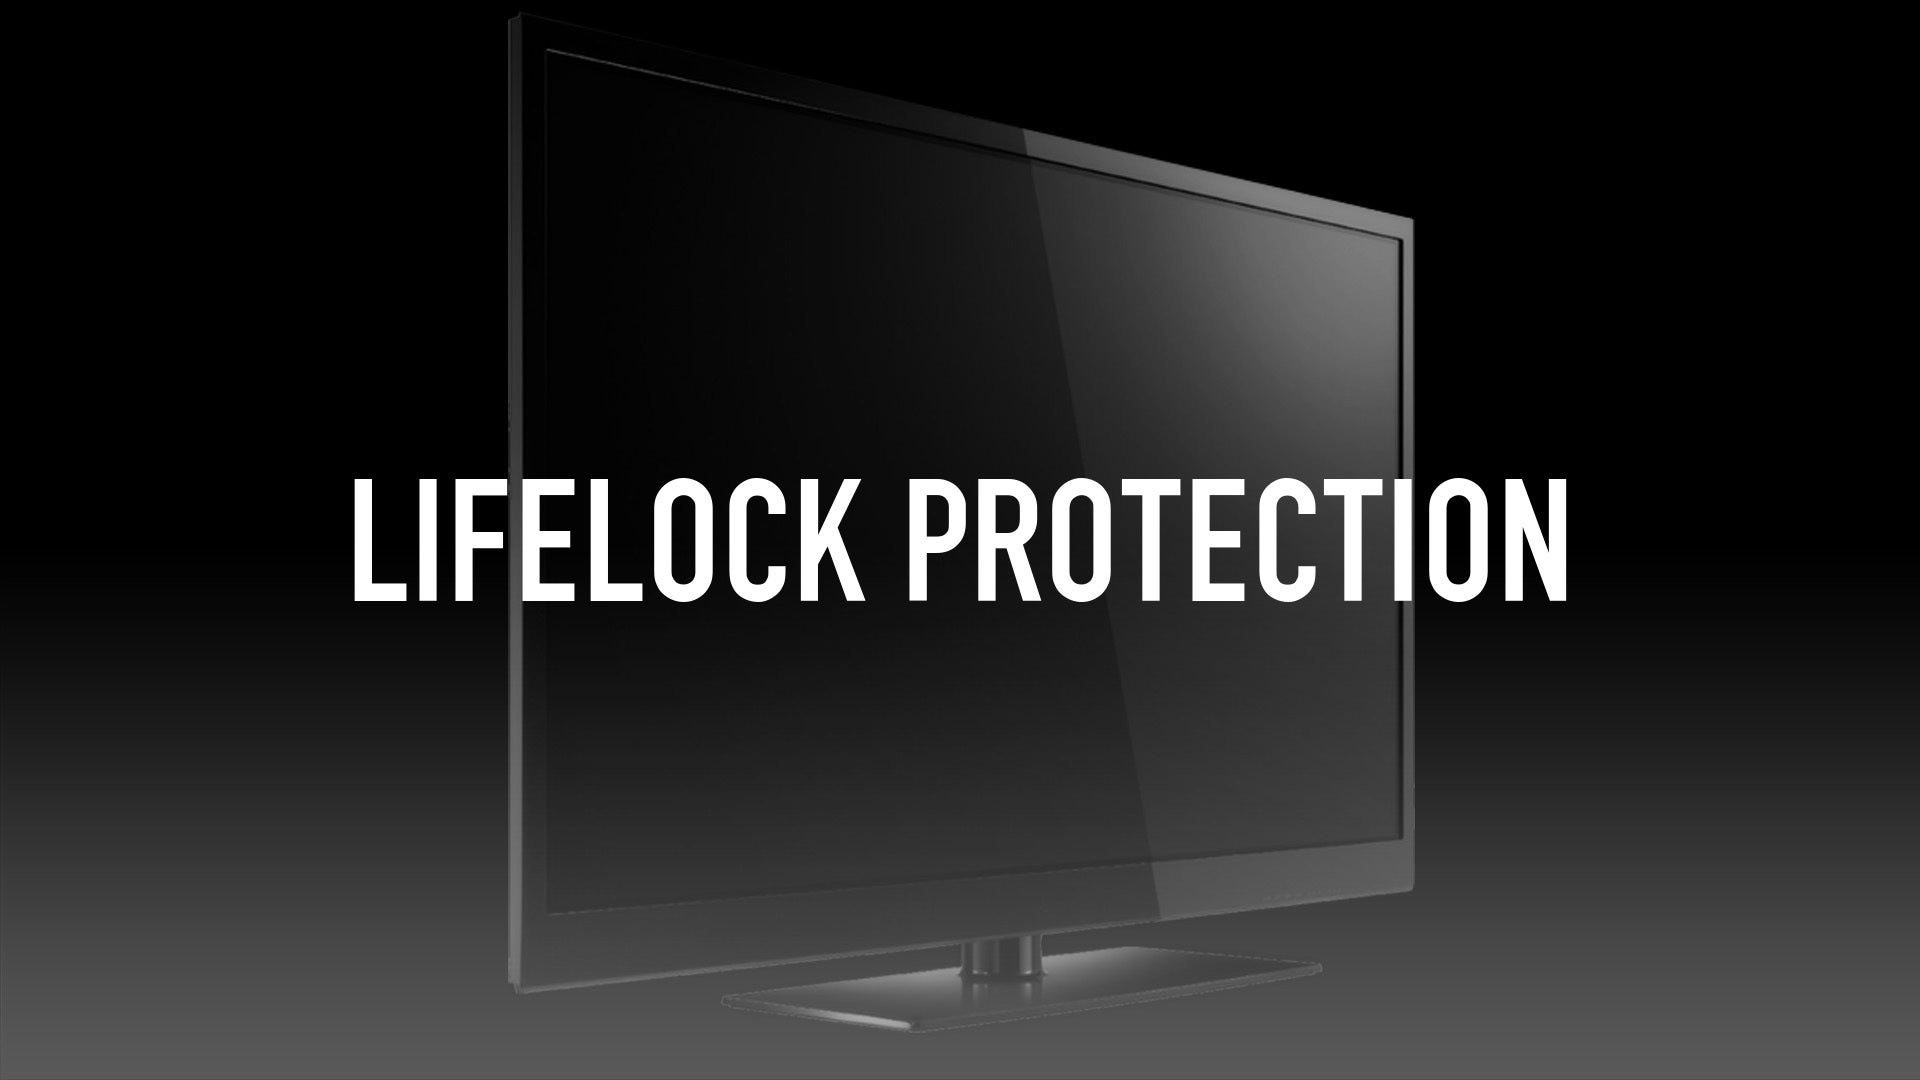 LifeLock Protection